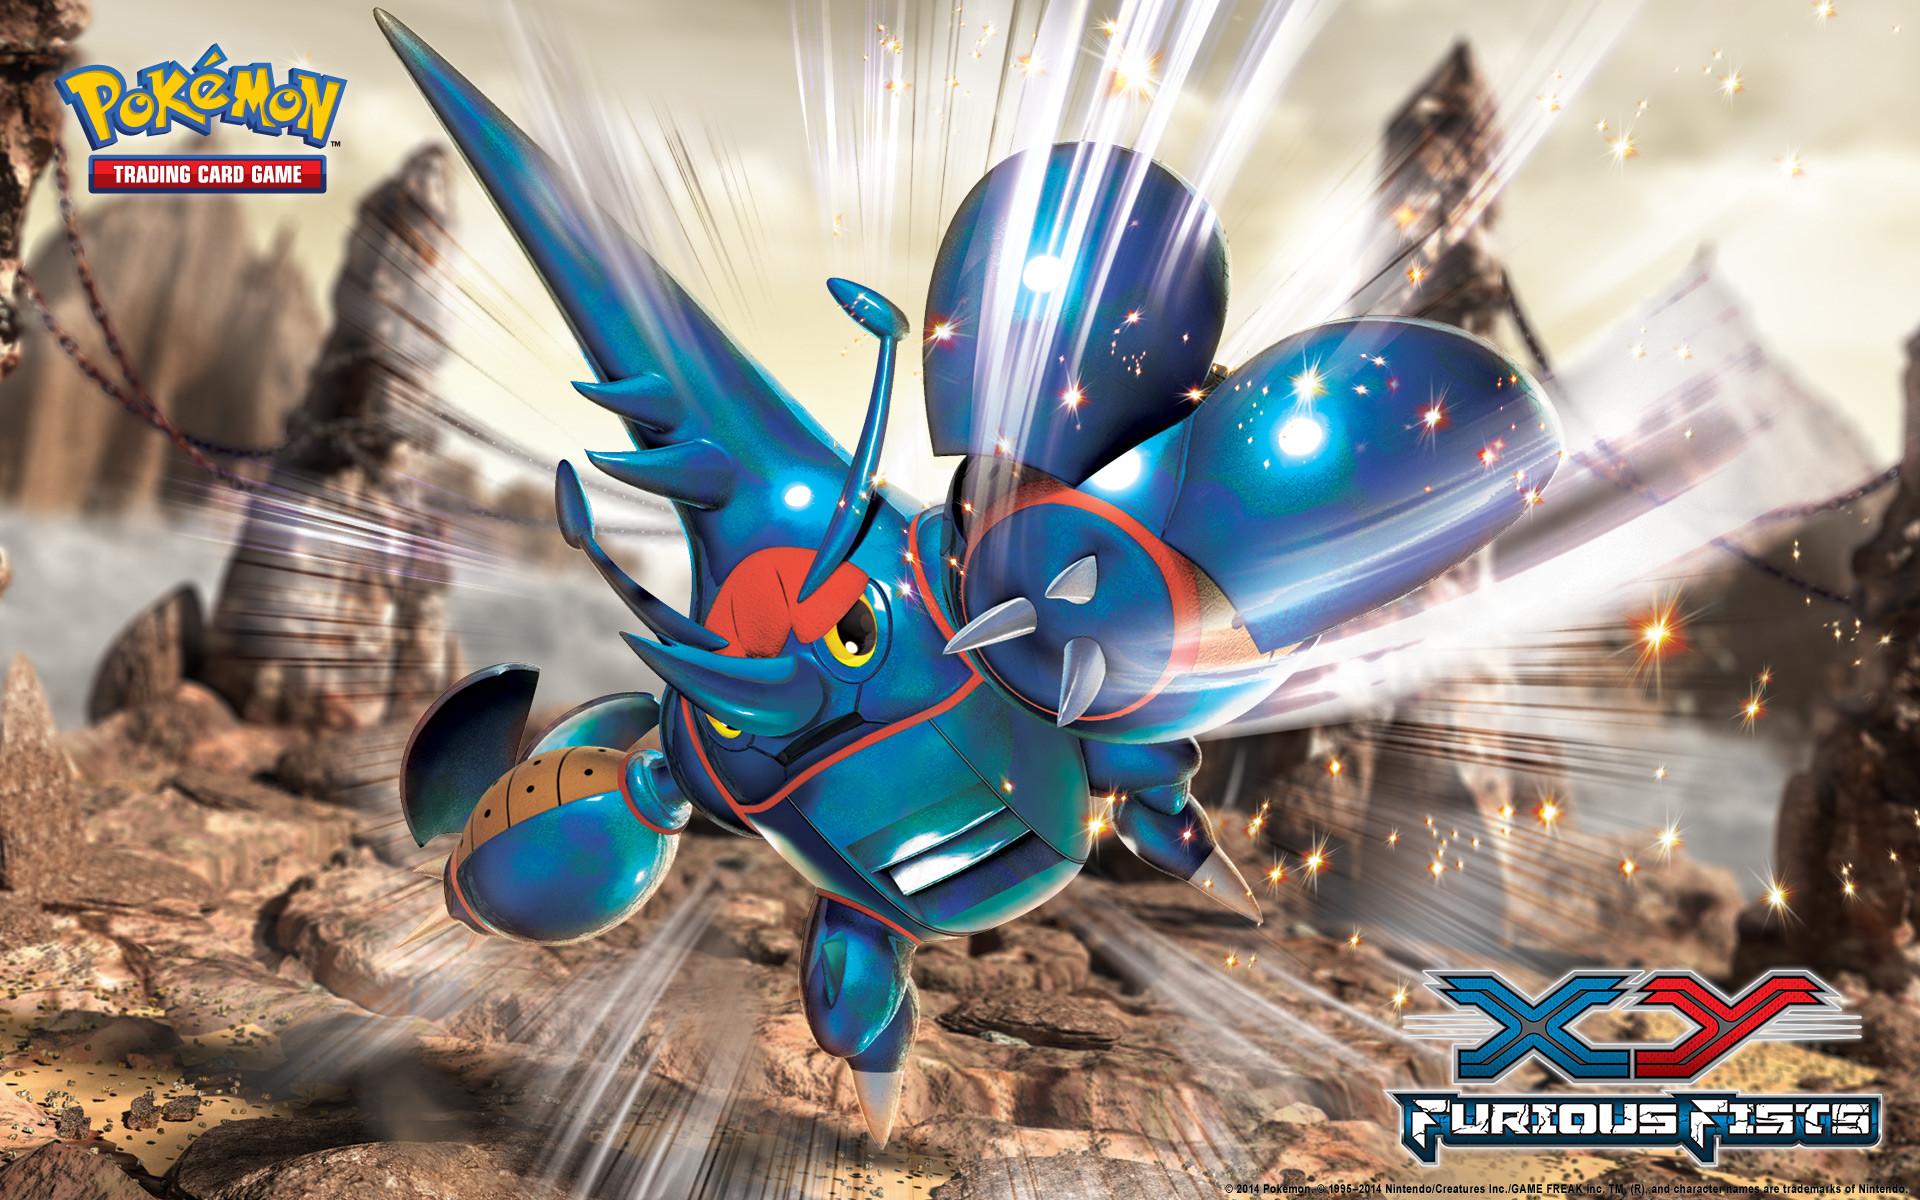 Pokémon TCG: XY—Furious Fists Mega Heracross Wallpaper